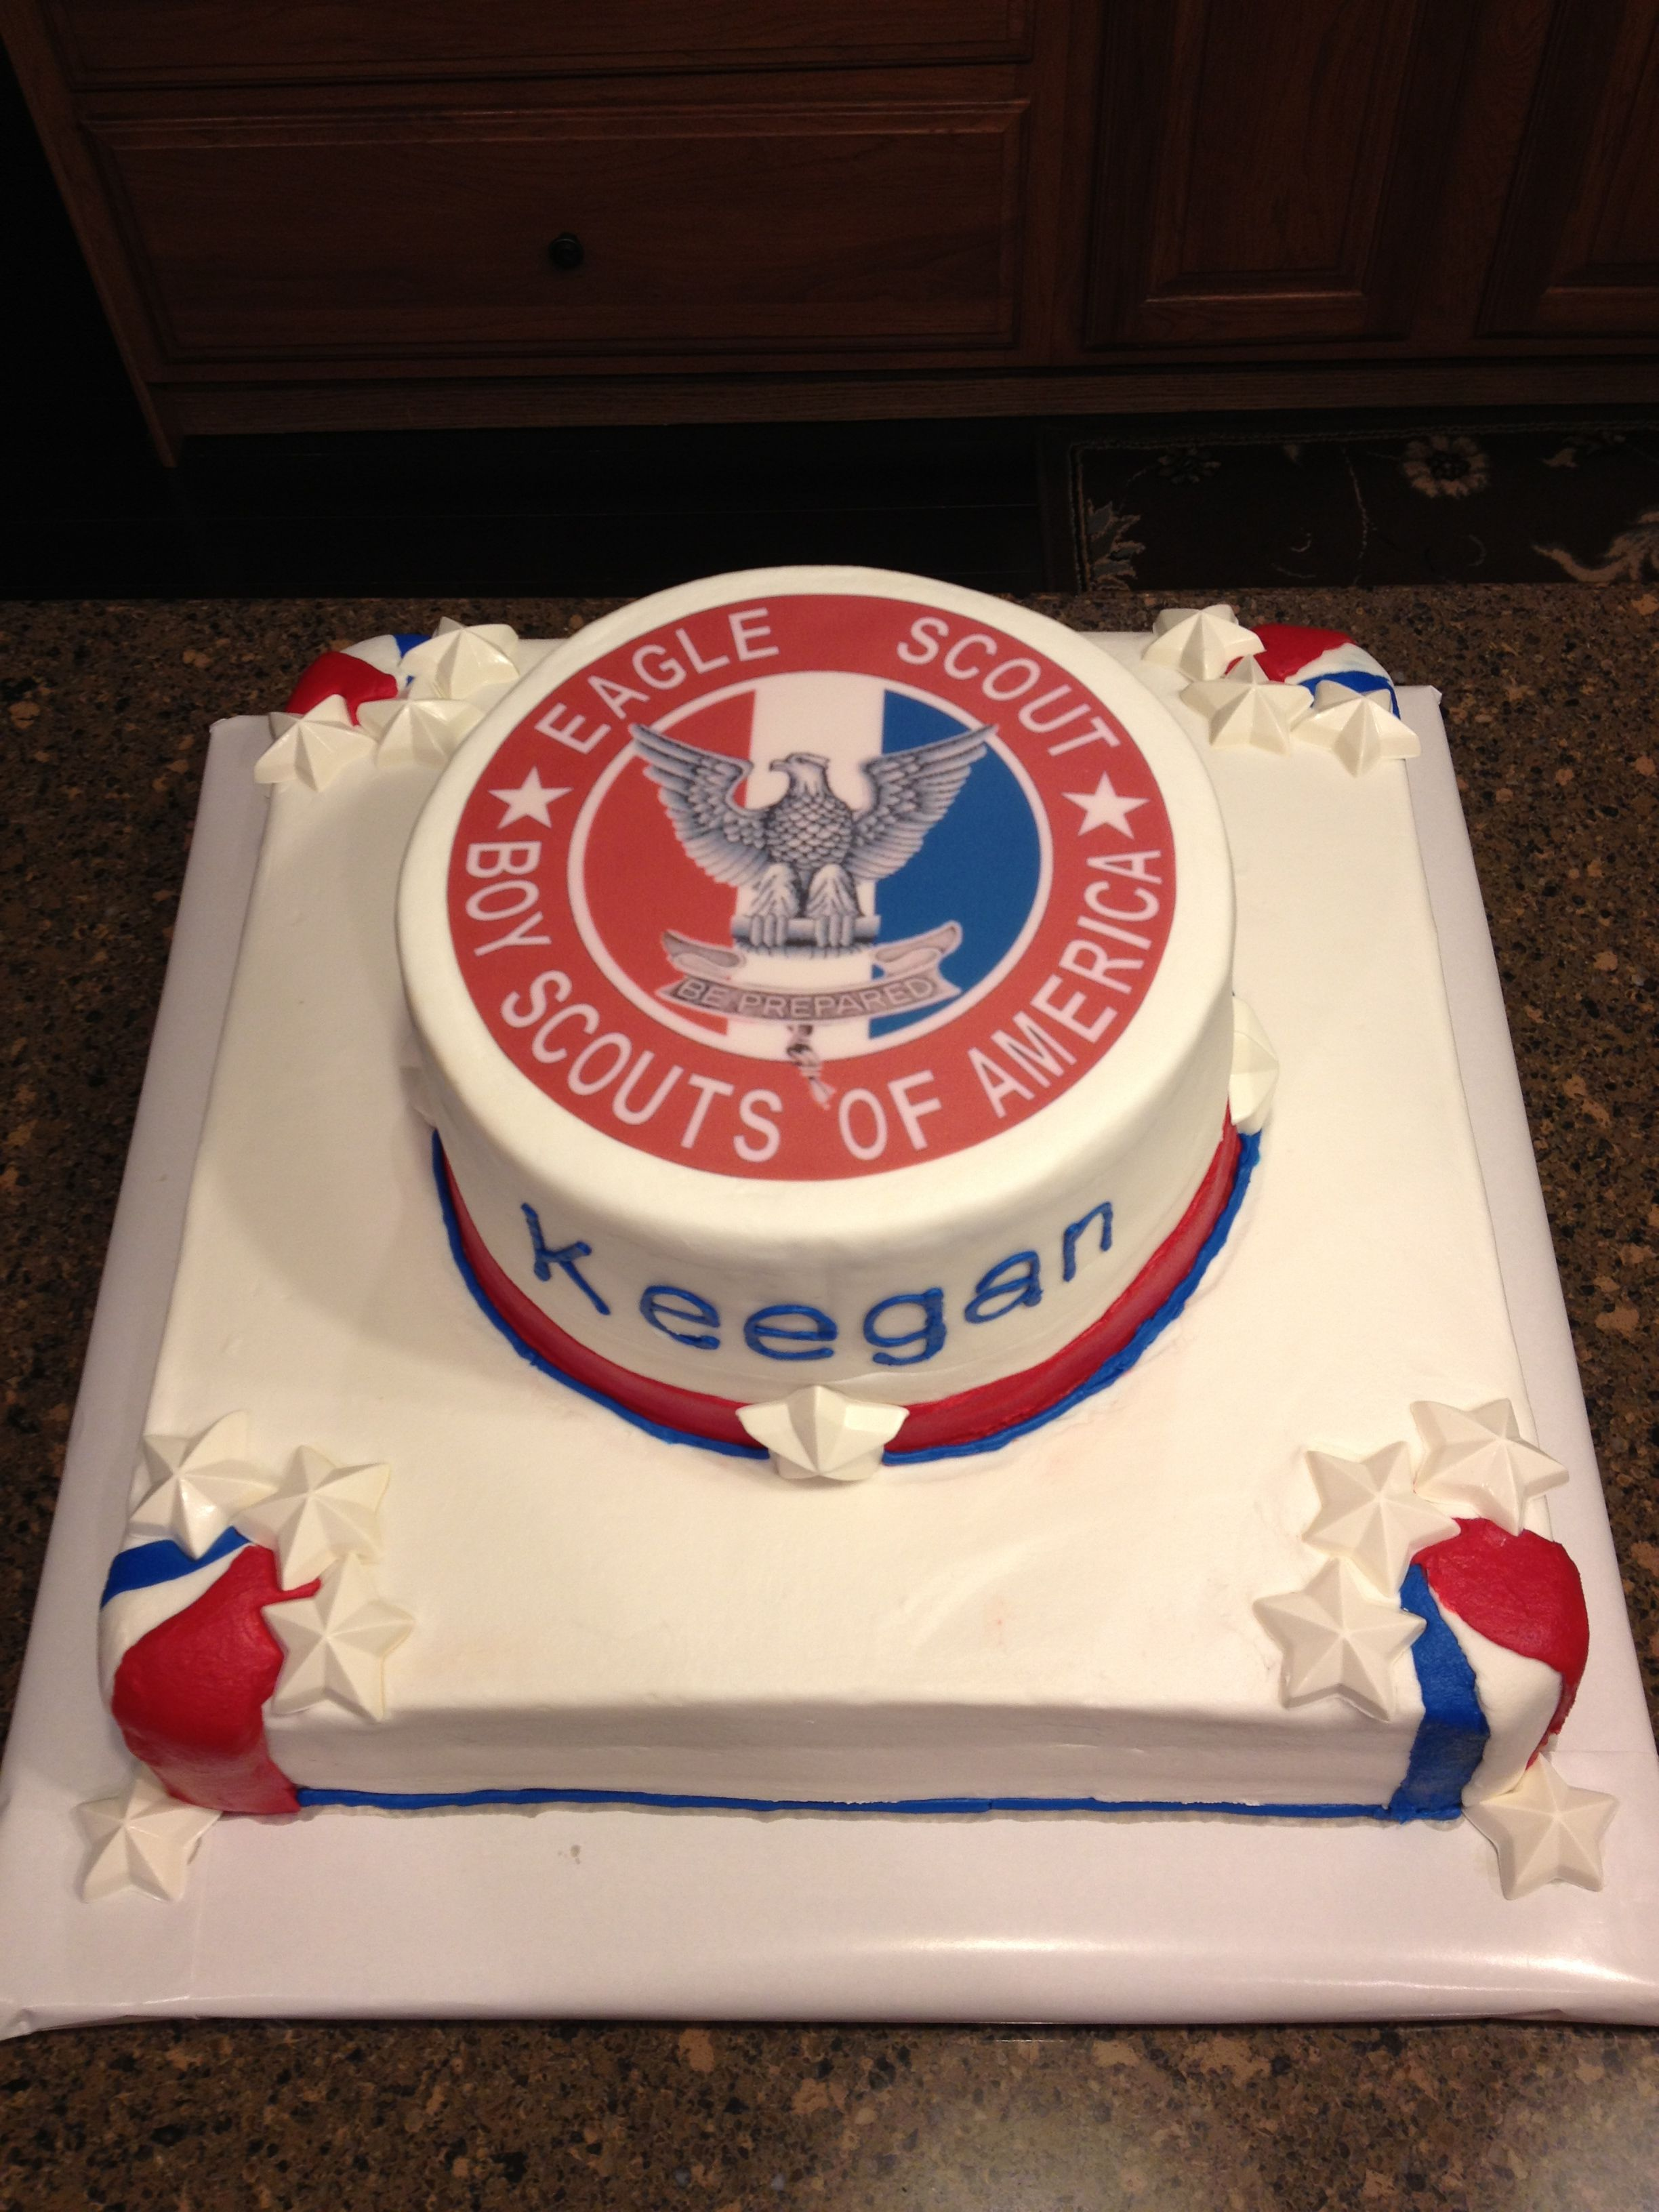 Boy Scouts Of America Cake Designs